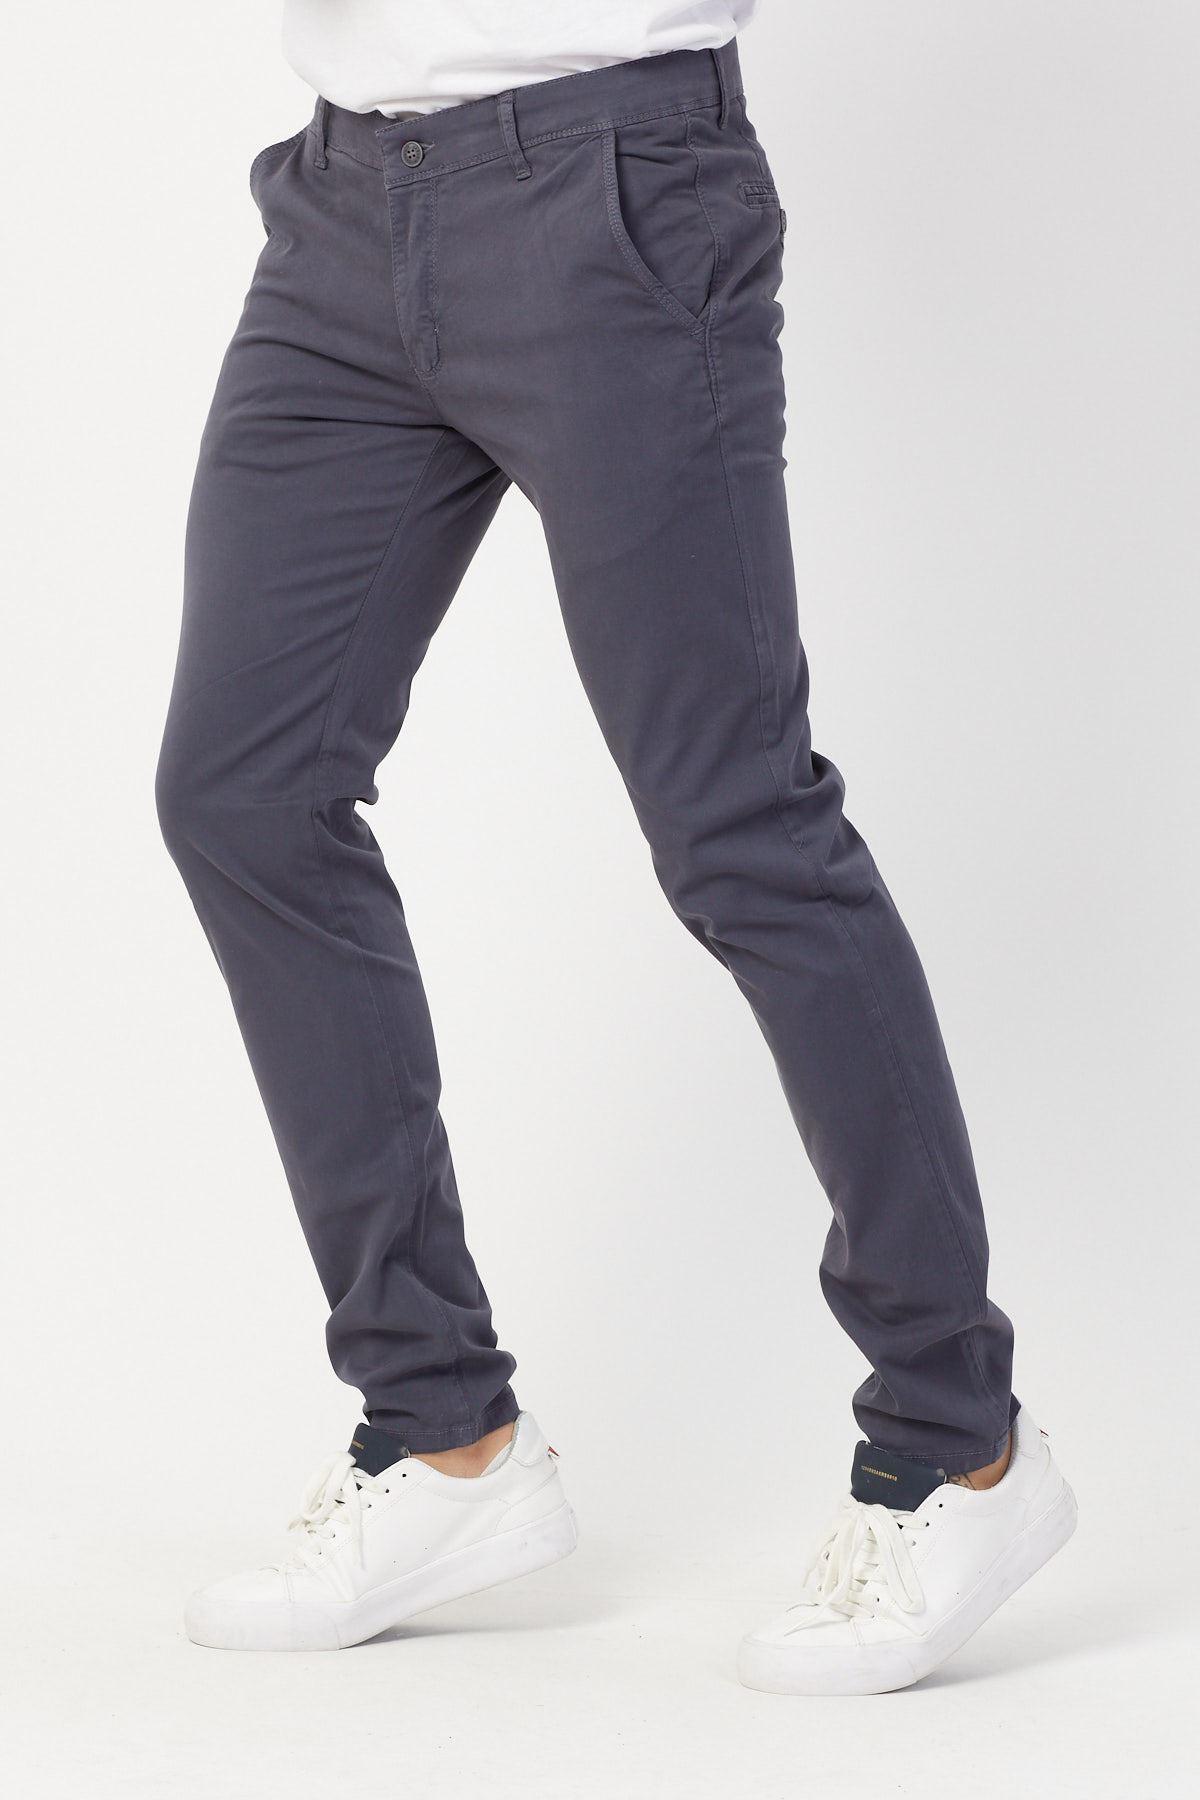 Yandan Cepli  Füme Keten Pantolon